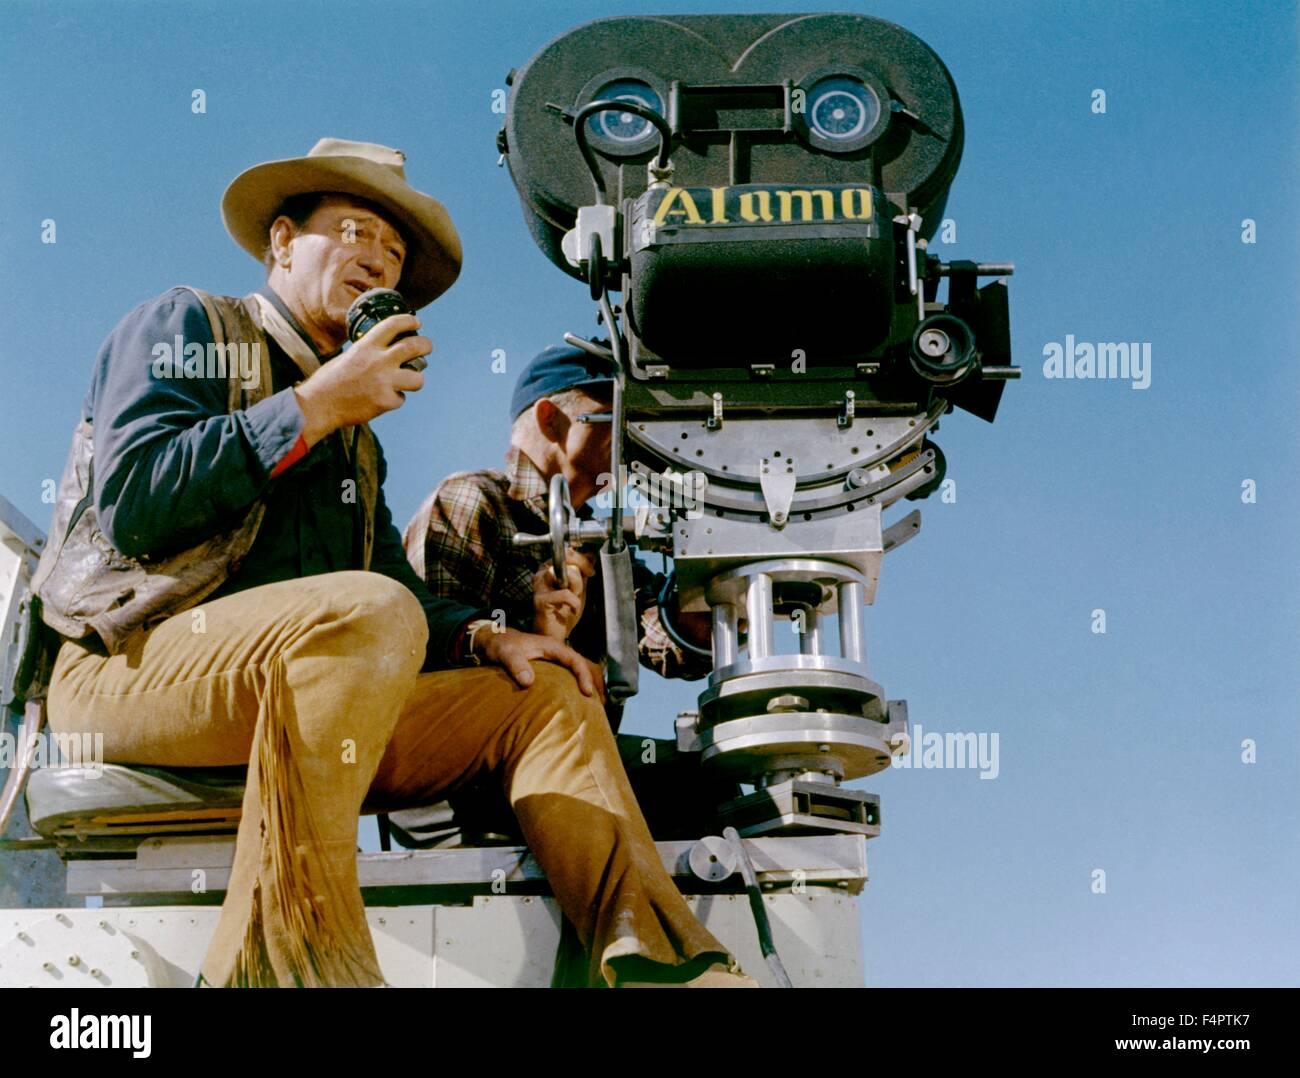 On the set, John Wayne / The Alamo / 1961 directed by John Wayne  [United Artists] - Stock Image